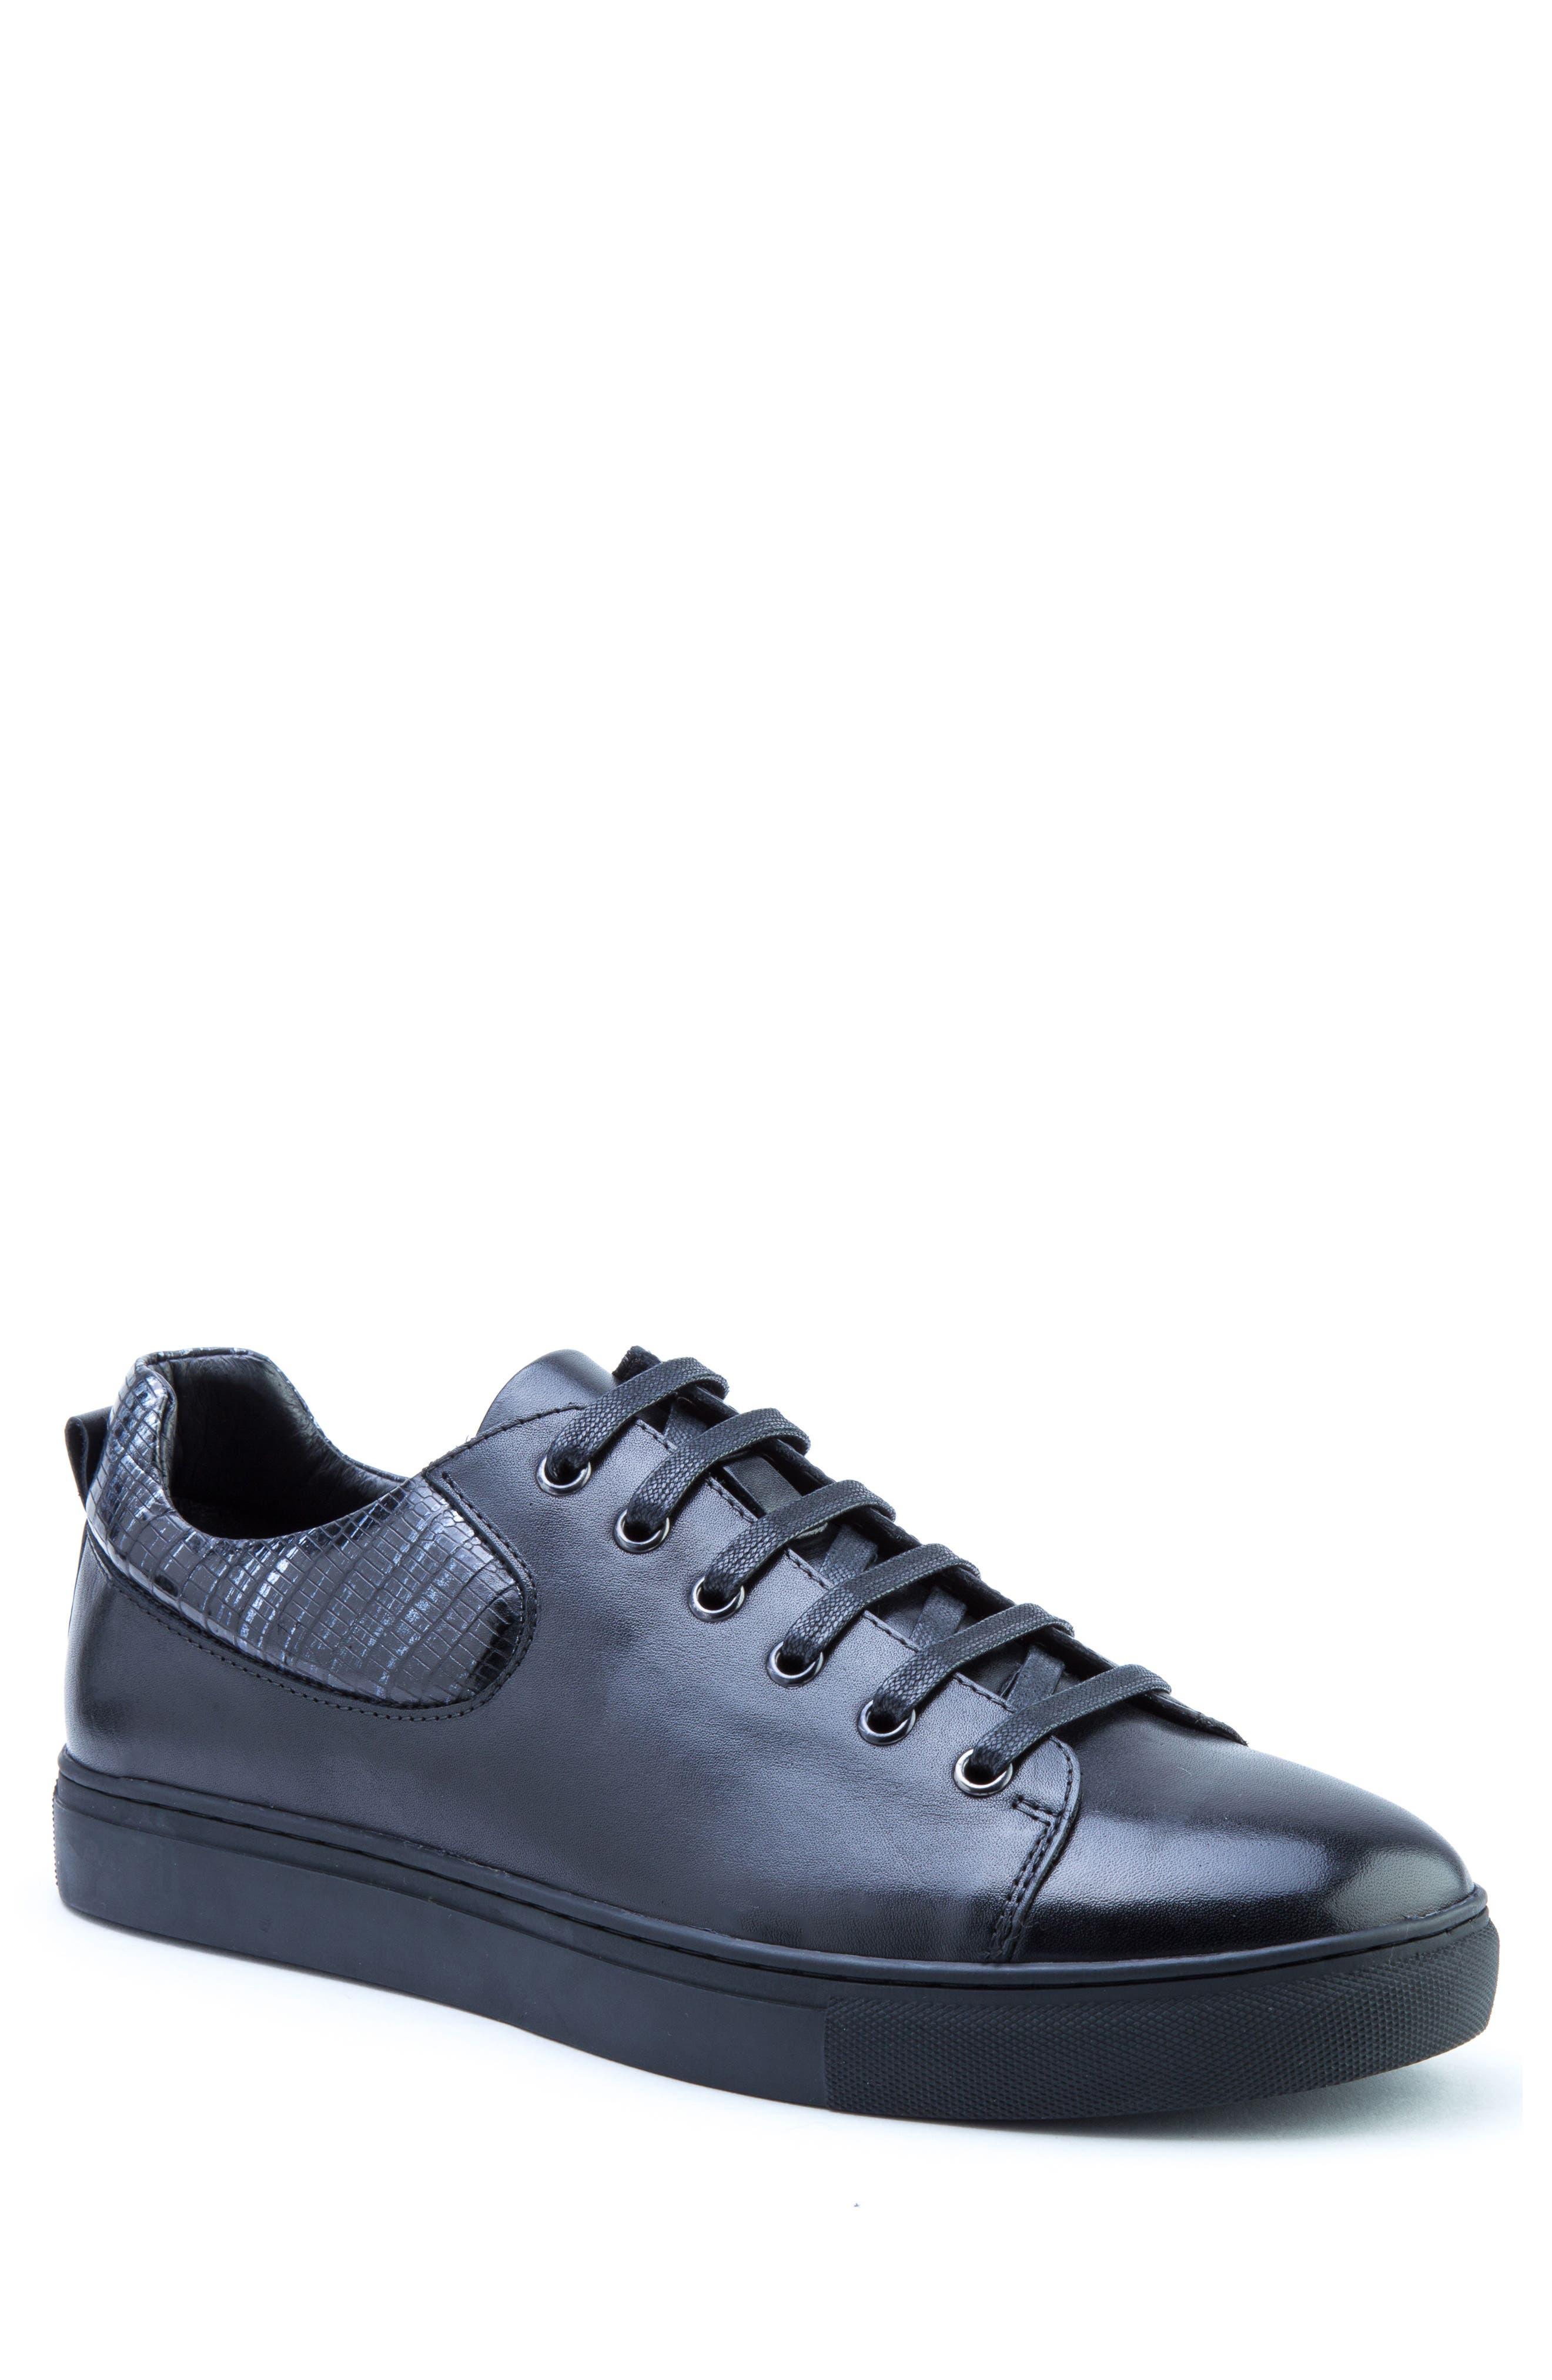 Robinson Sneaker,                             Main thumbnail 1, color,                             Black Leather